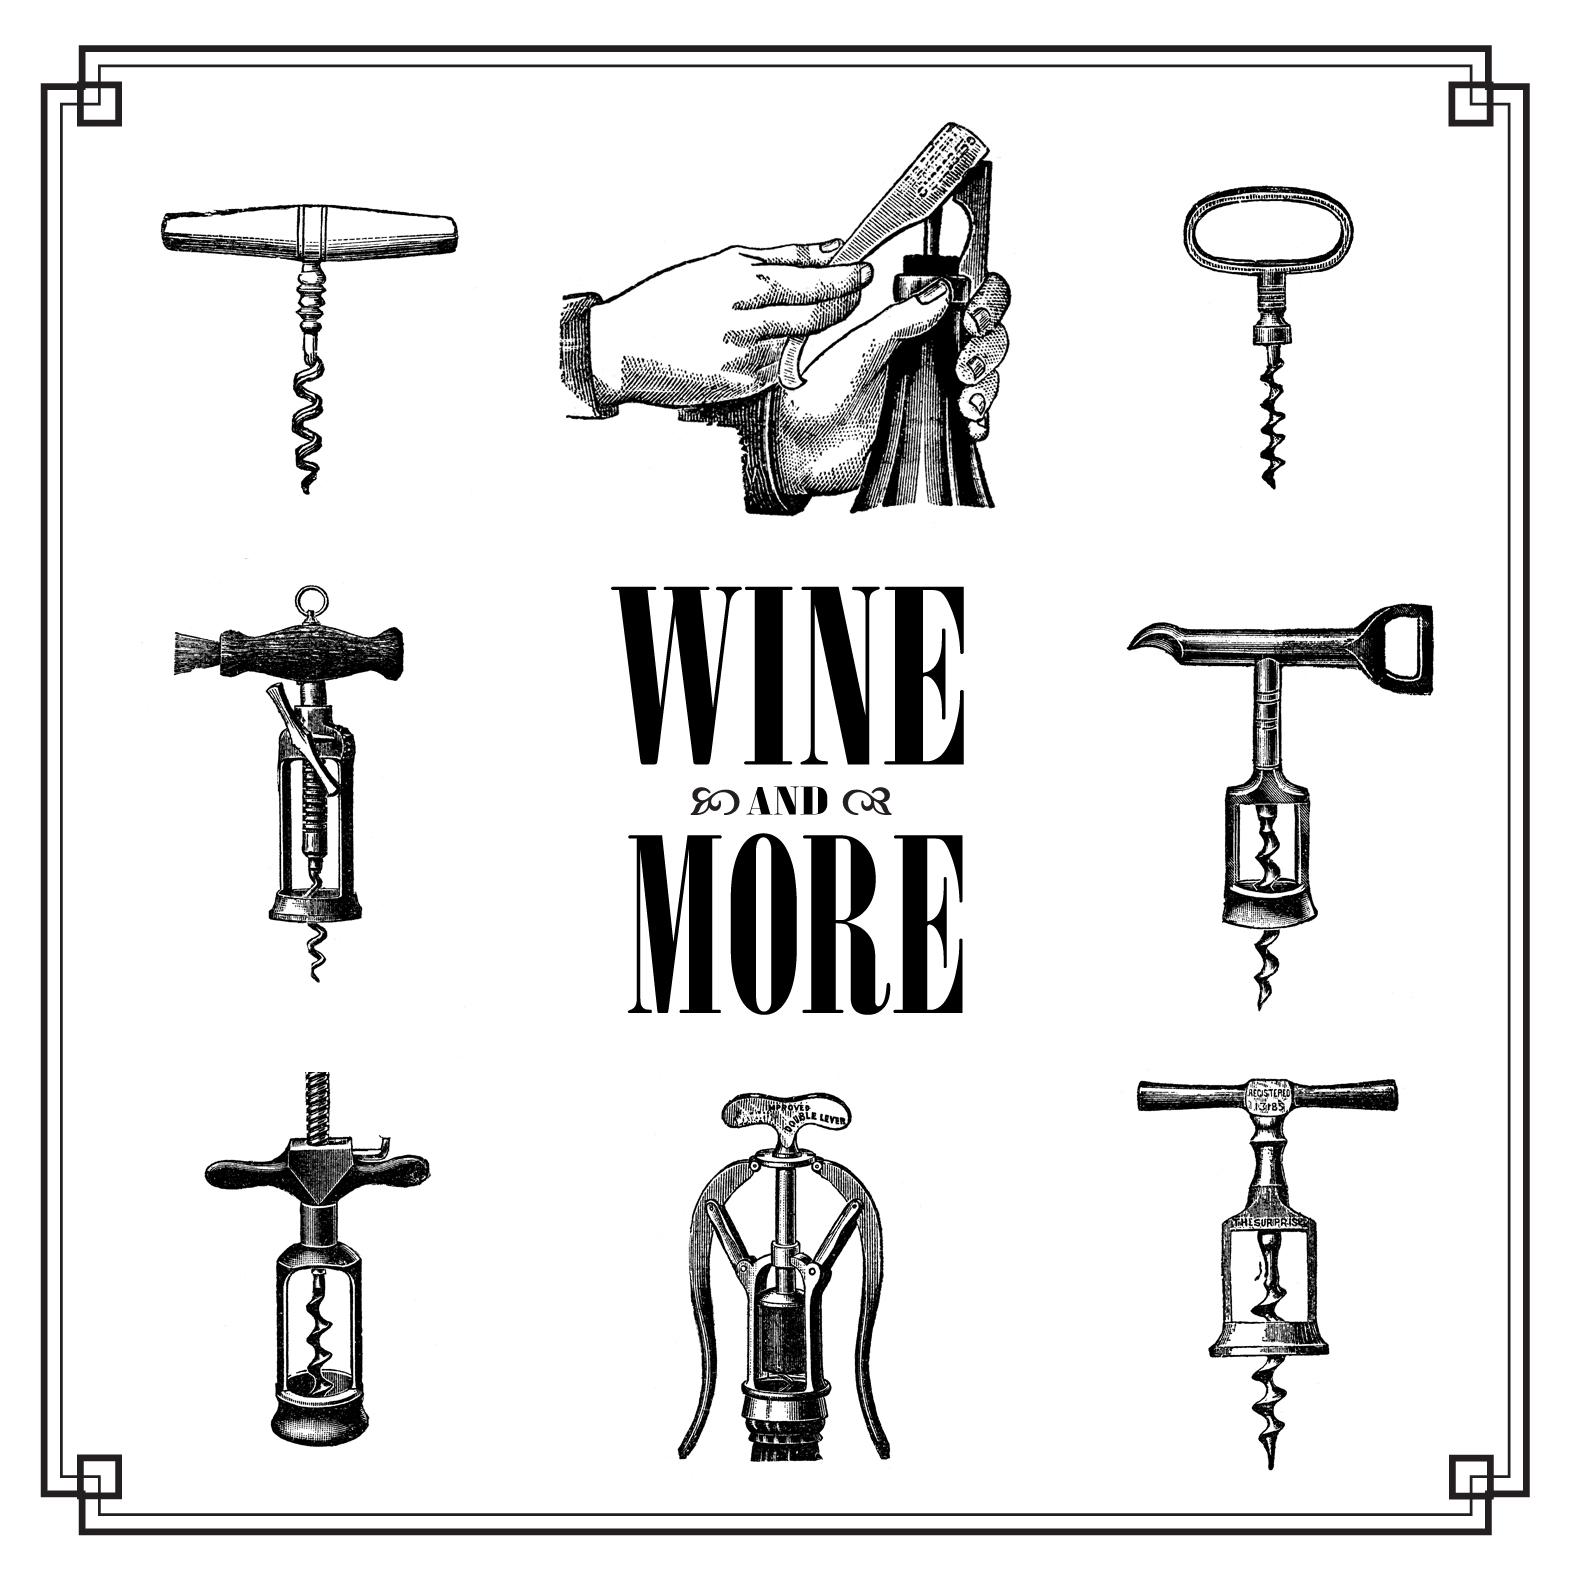 Free Vintage Clip Art Images Vintage Corkscrew Wine Openers